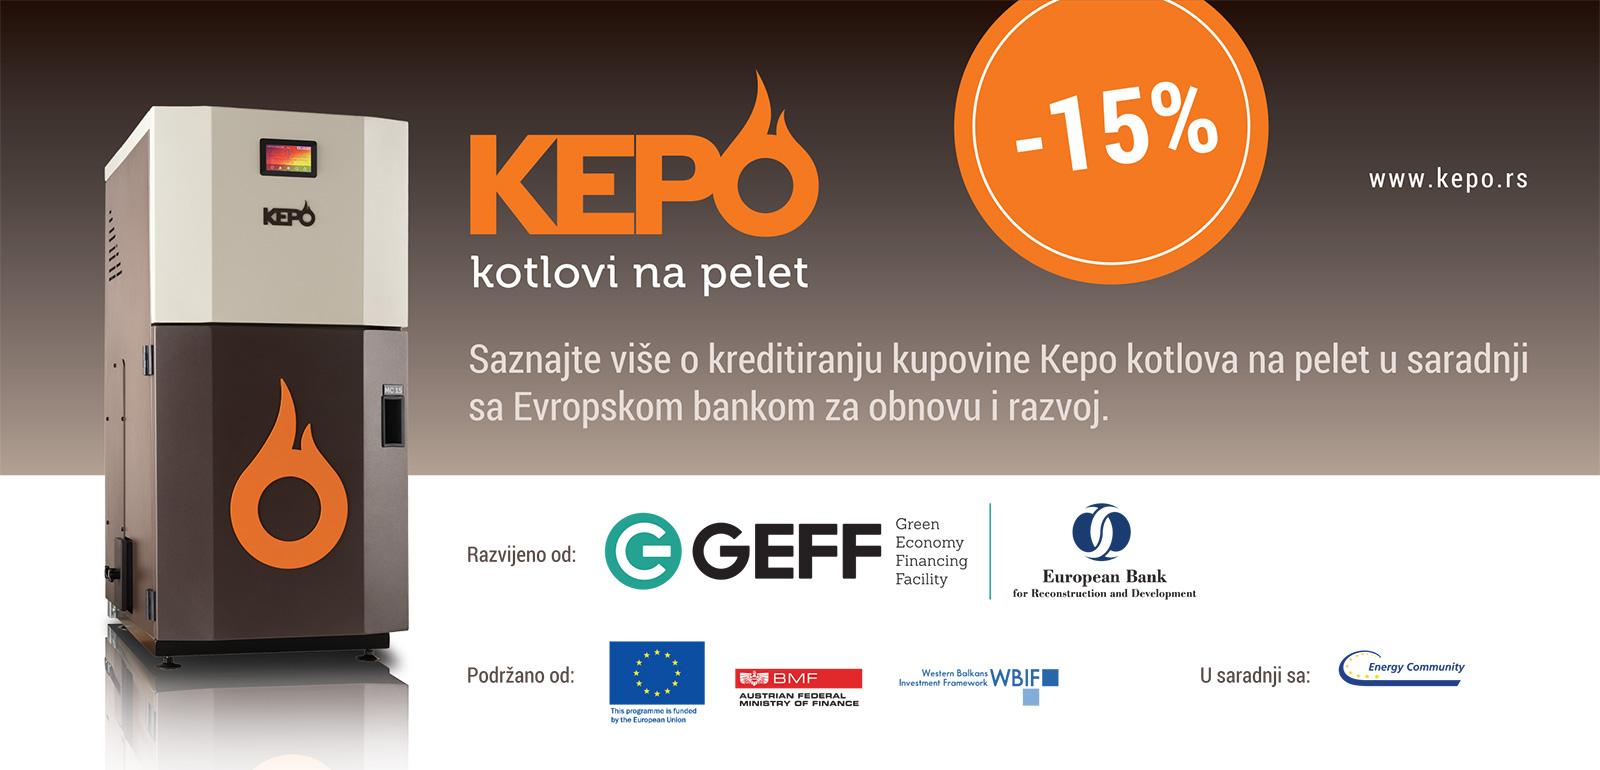 Kepo Geff 2020